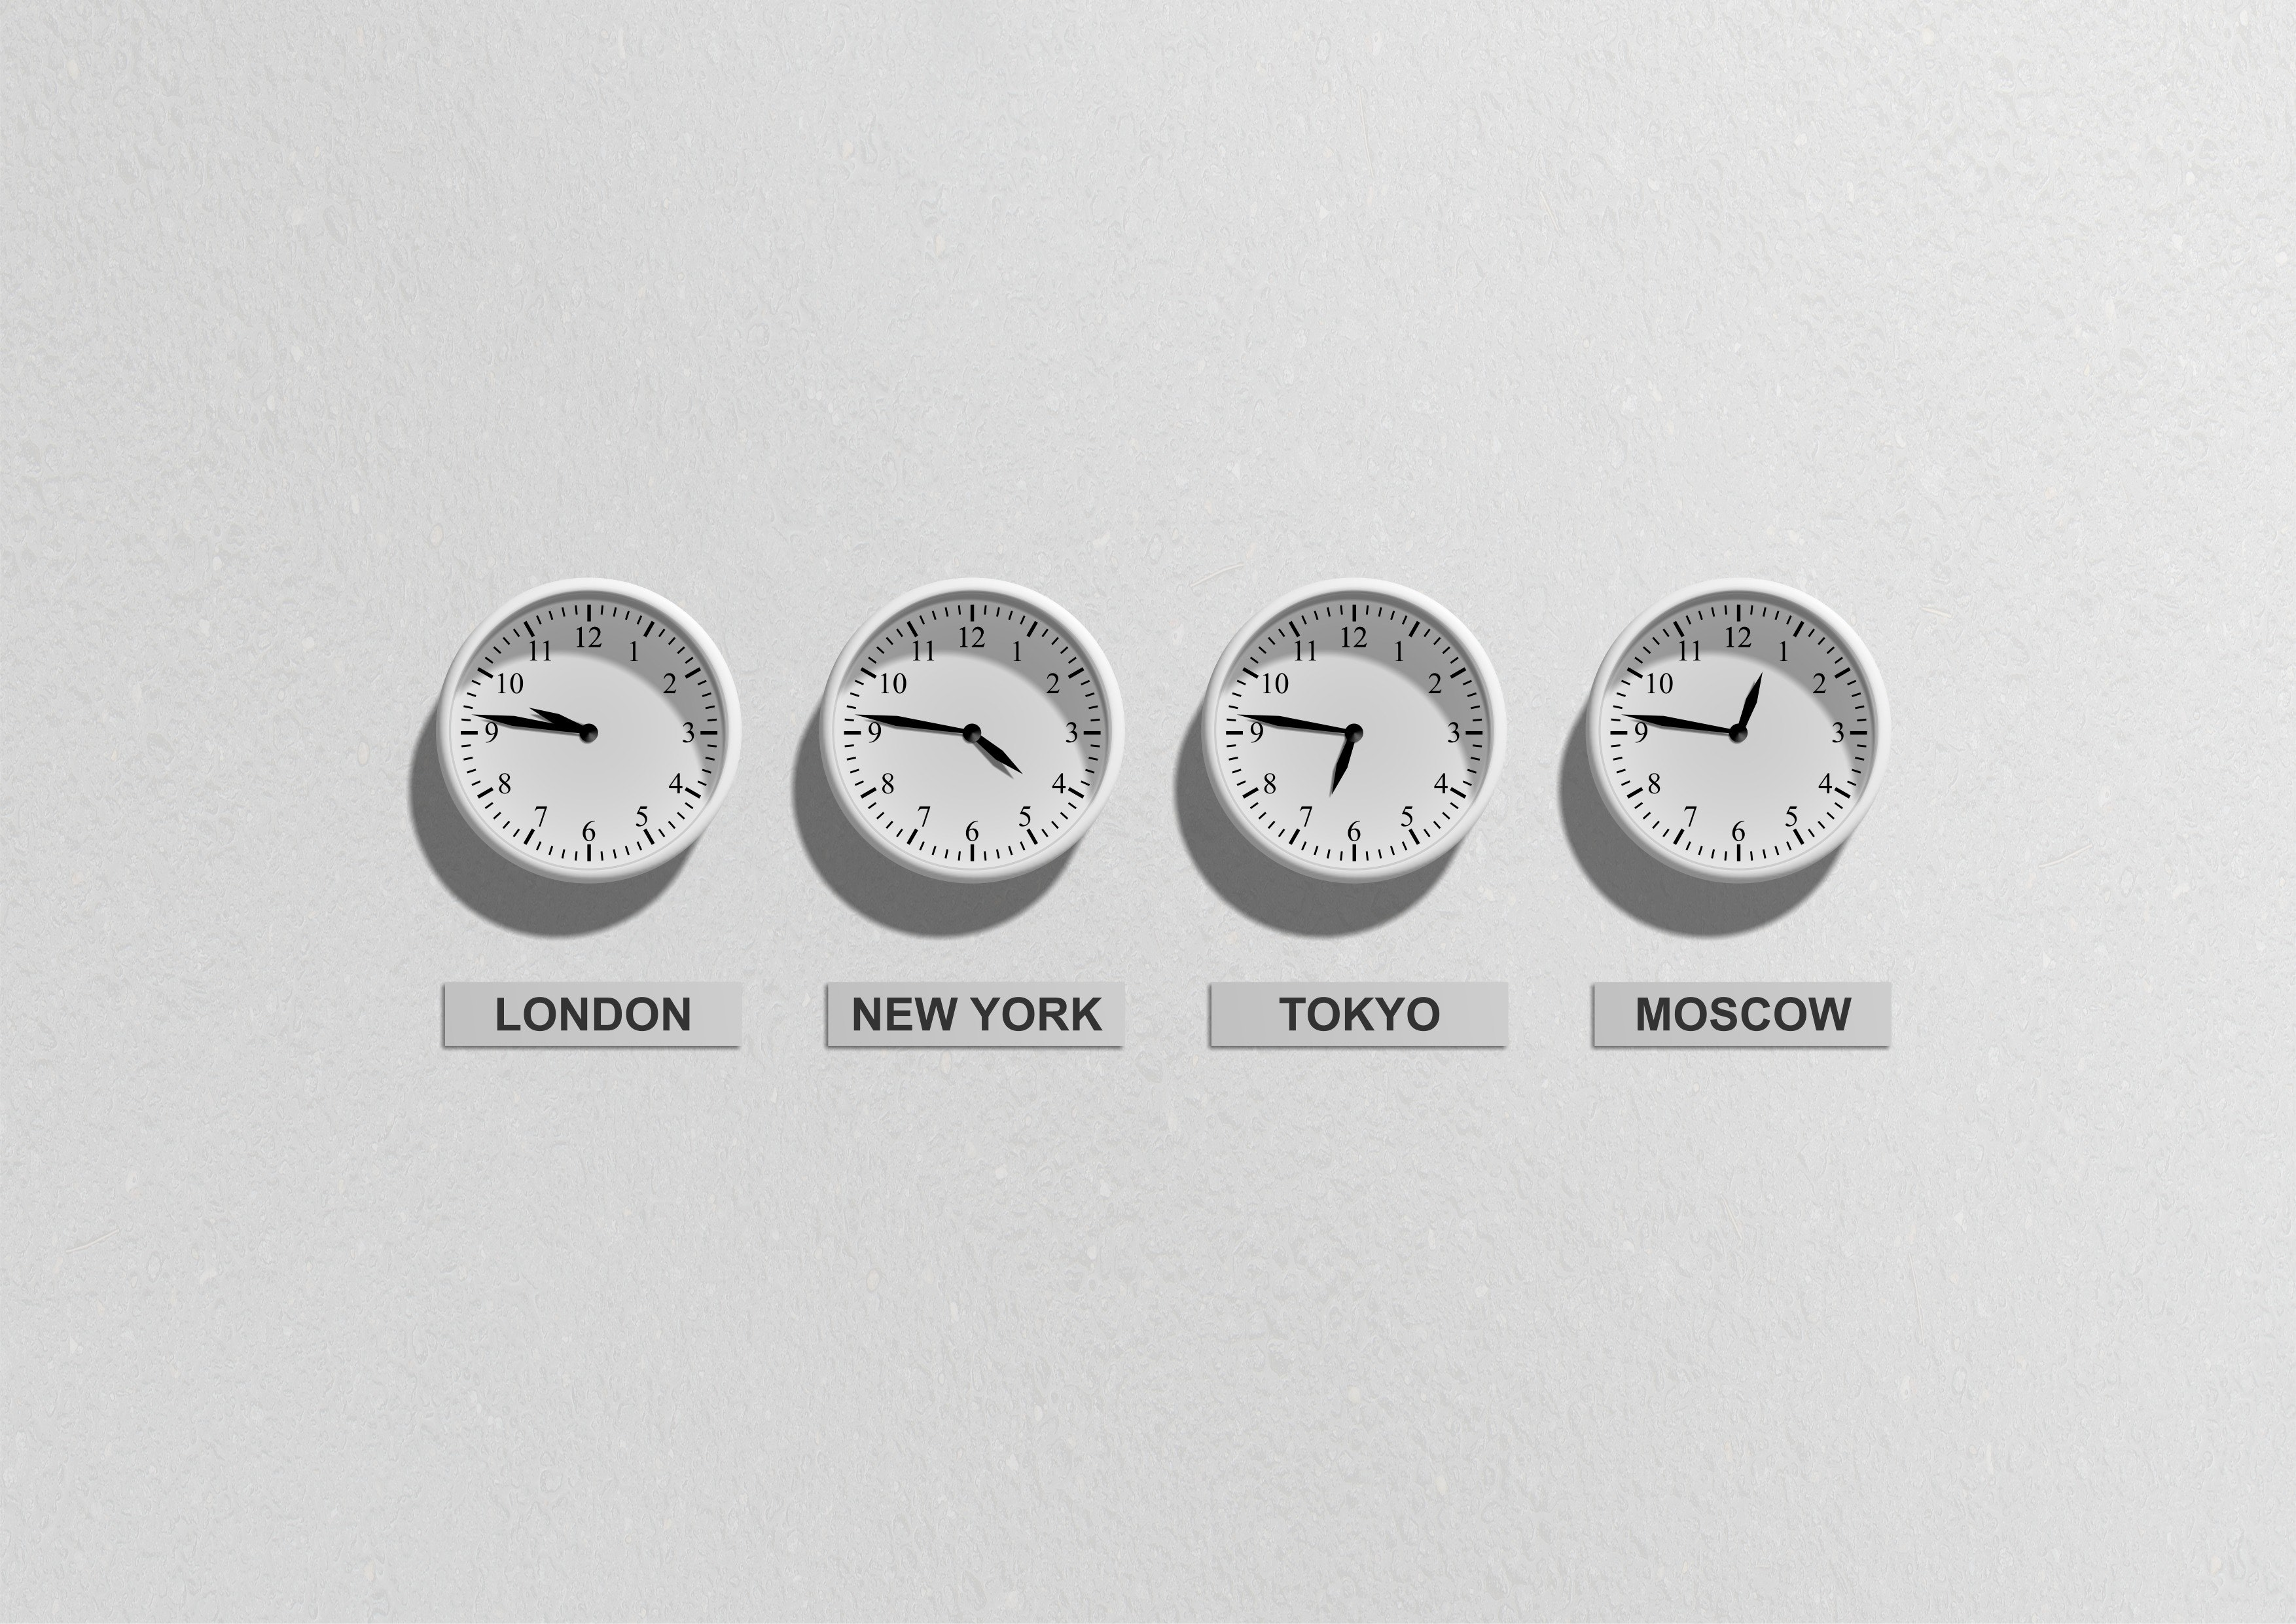 80b9b45c274 London New York Tokyo and Moscow Clocks · Free Stock Photo